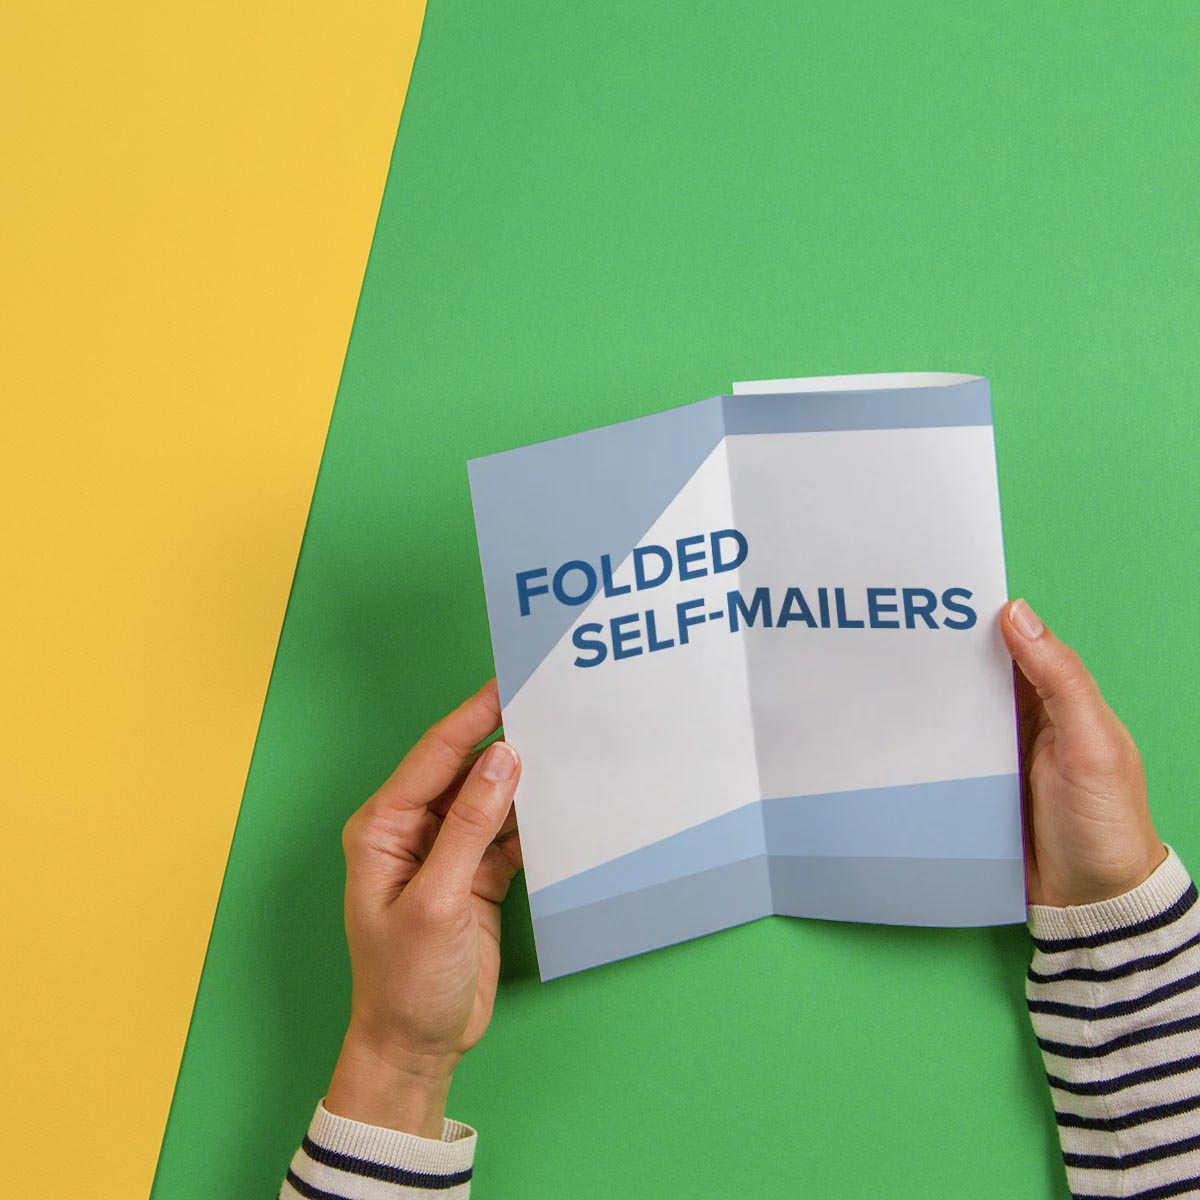 Folded Self Mailers